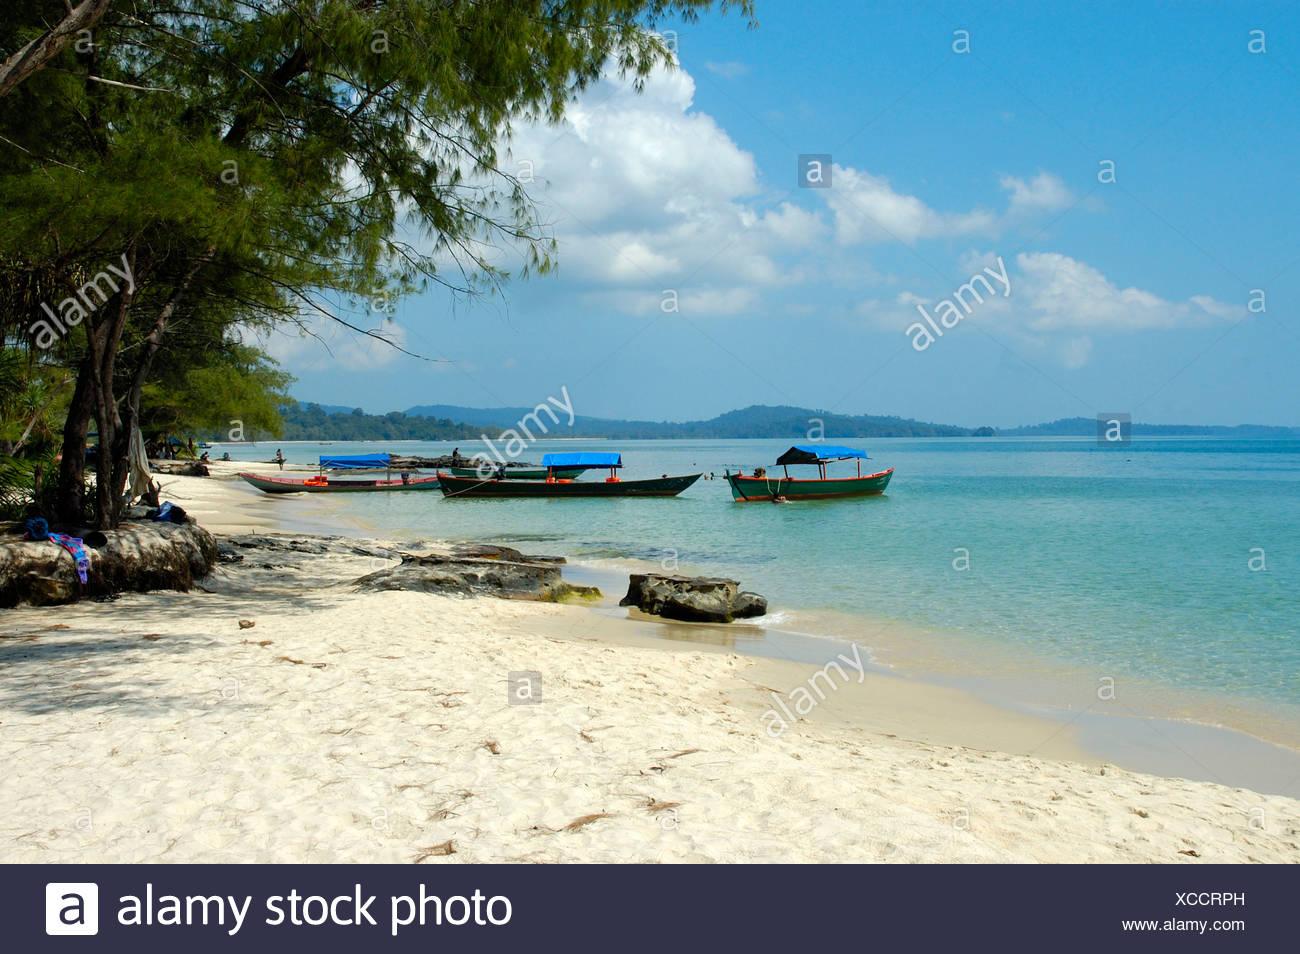 Fishing boats, secluded white sandy beach, clear blue water, Ream Nationalpark near Sihanoukville, Kompong Som, Kambodscha, Sou Stock Photo